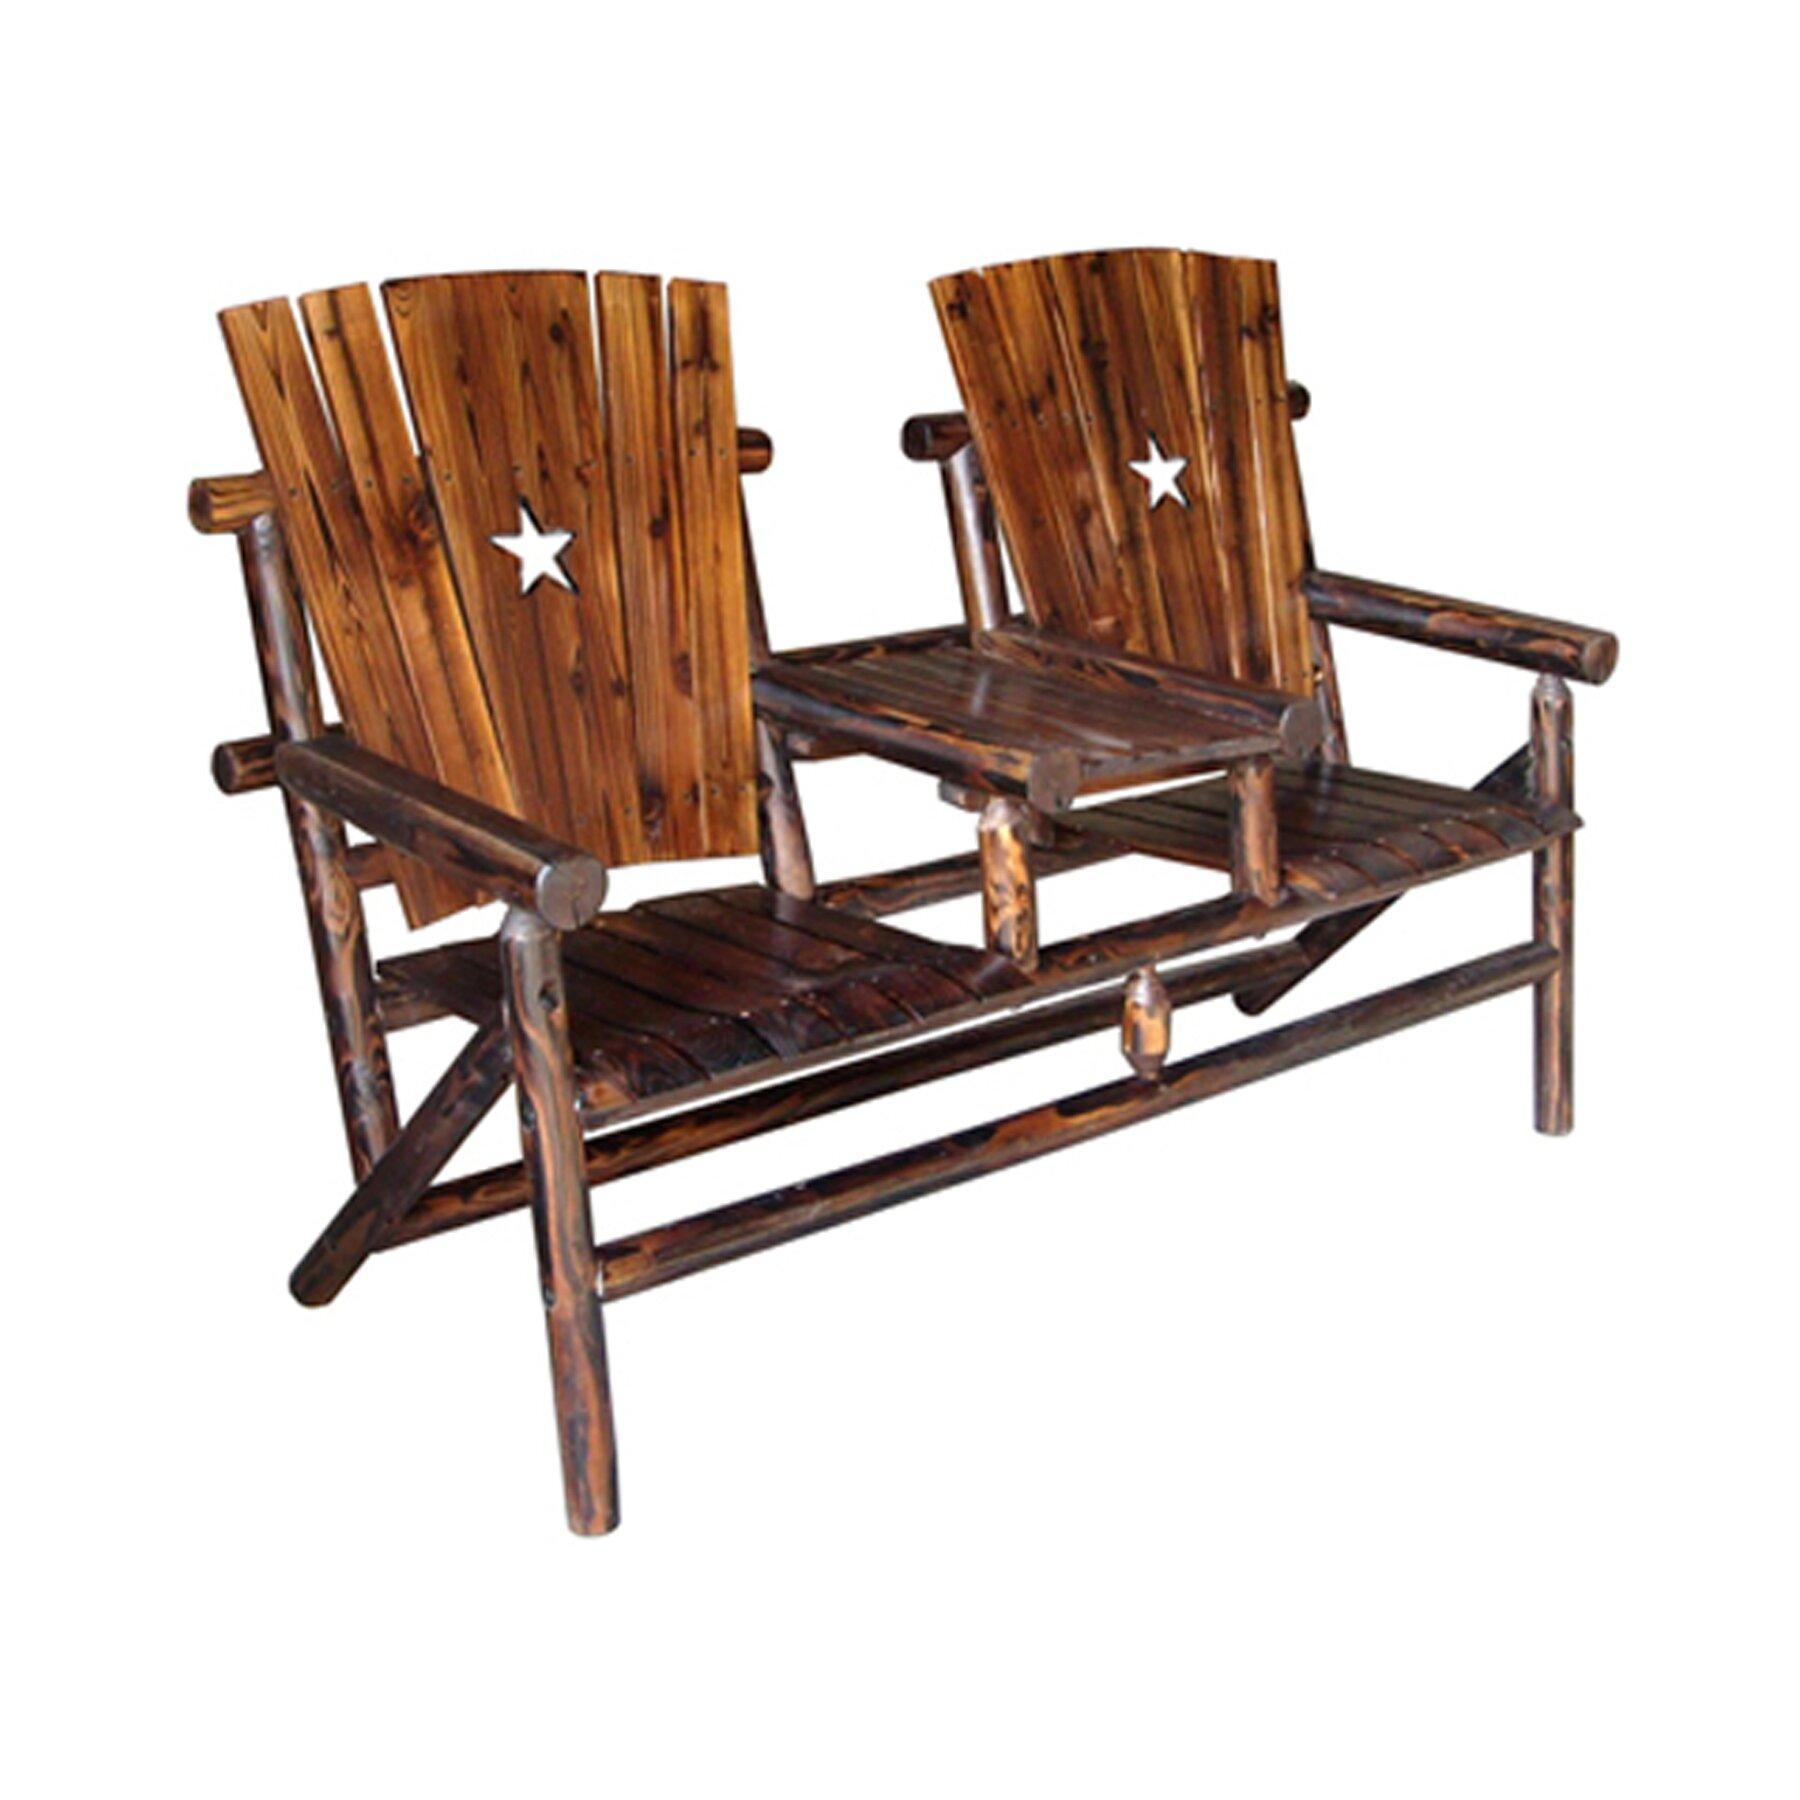 Leighcountry Char Log Cut Out Star Double Arm Chair I